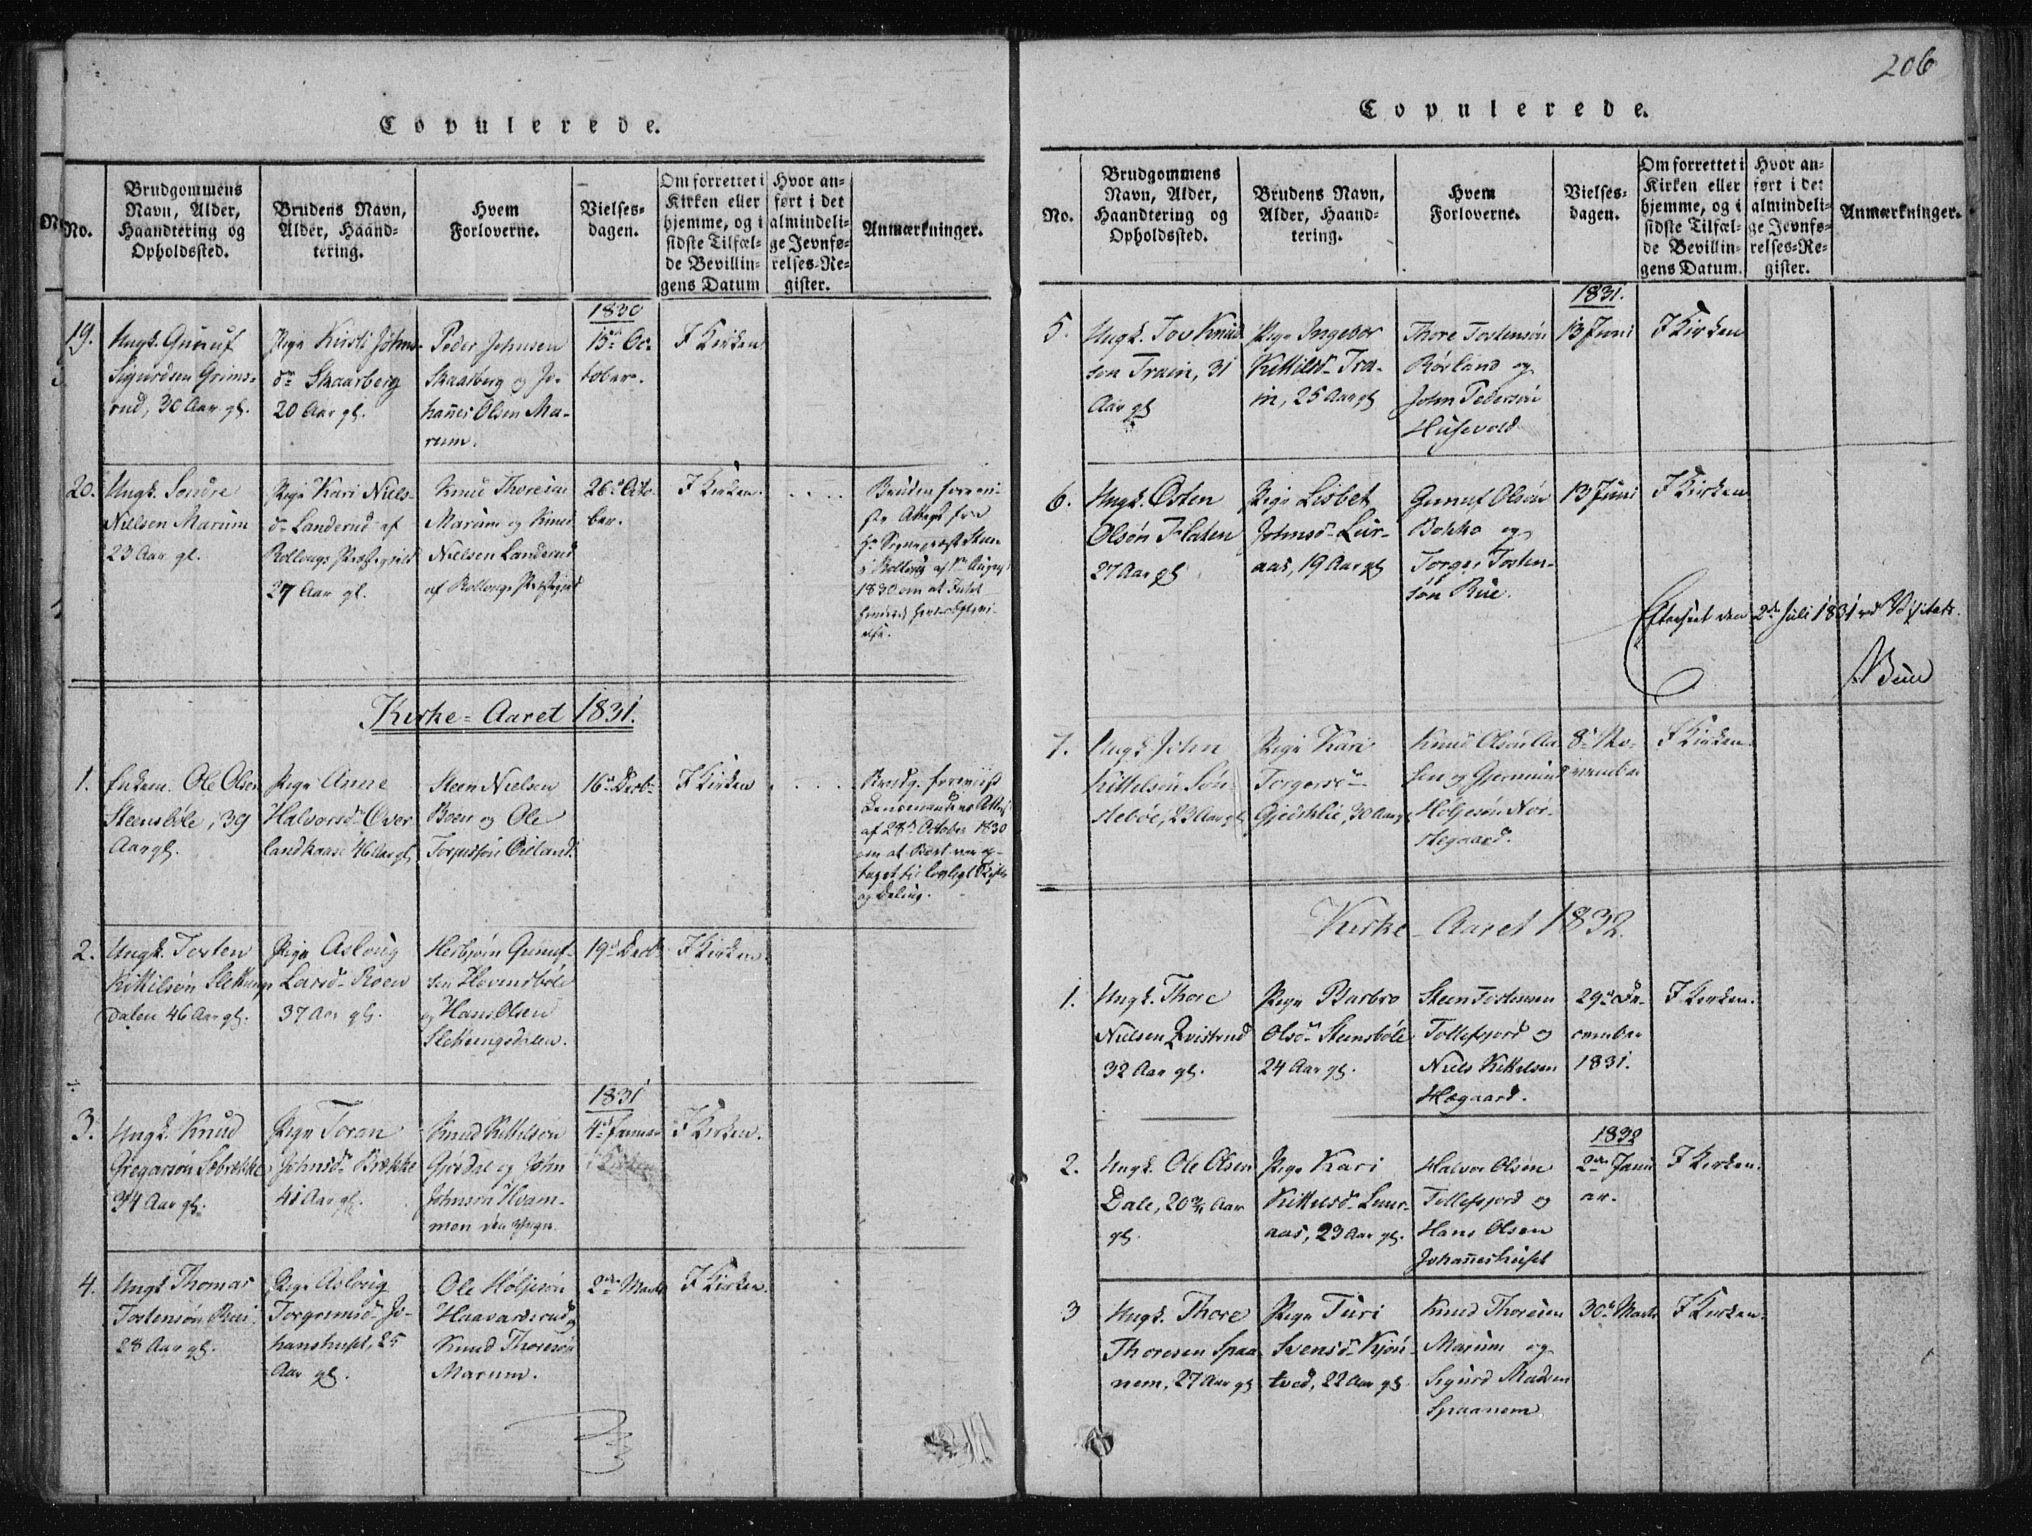 SAKO, Tinn kirkebøker, F/Fa/L0004: Ministerialbok nr. I 4, 1815-1843, s. 206